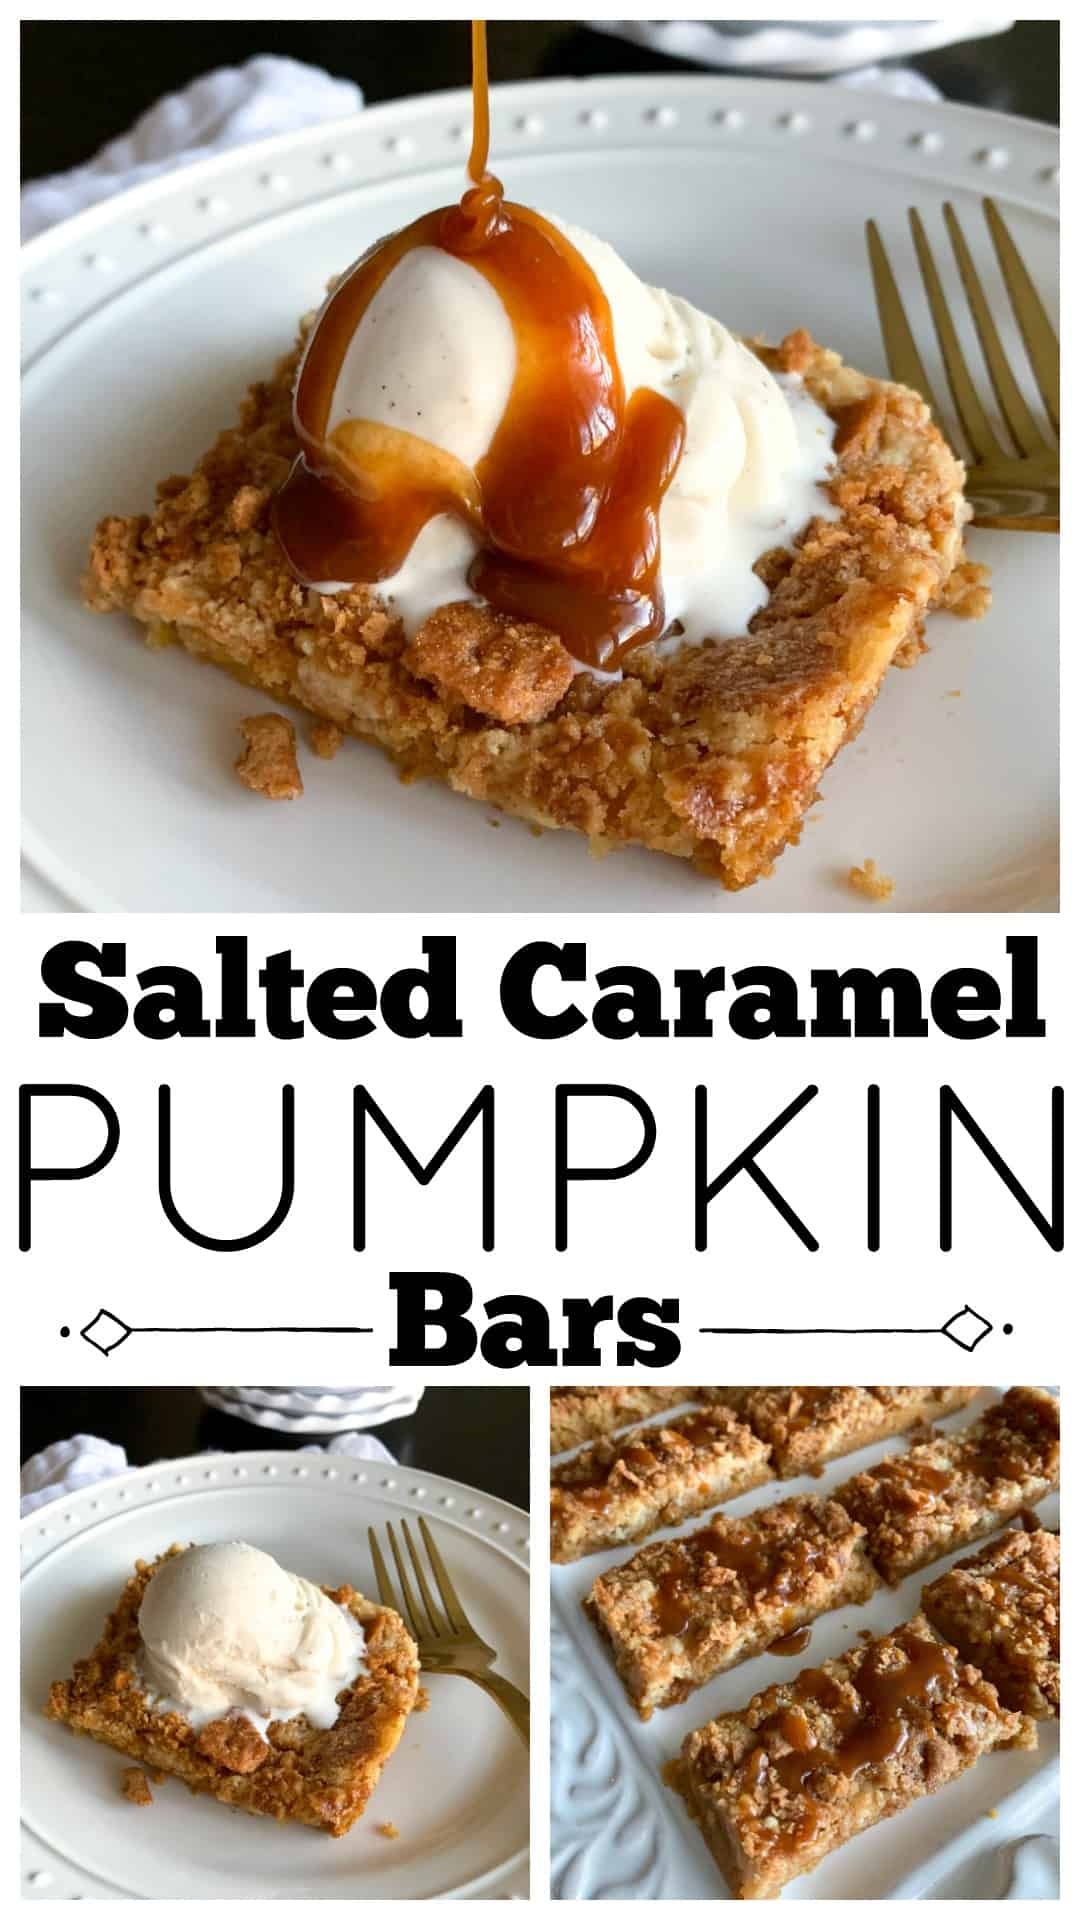 pumpkin bars photo collage